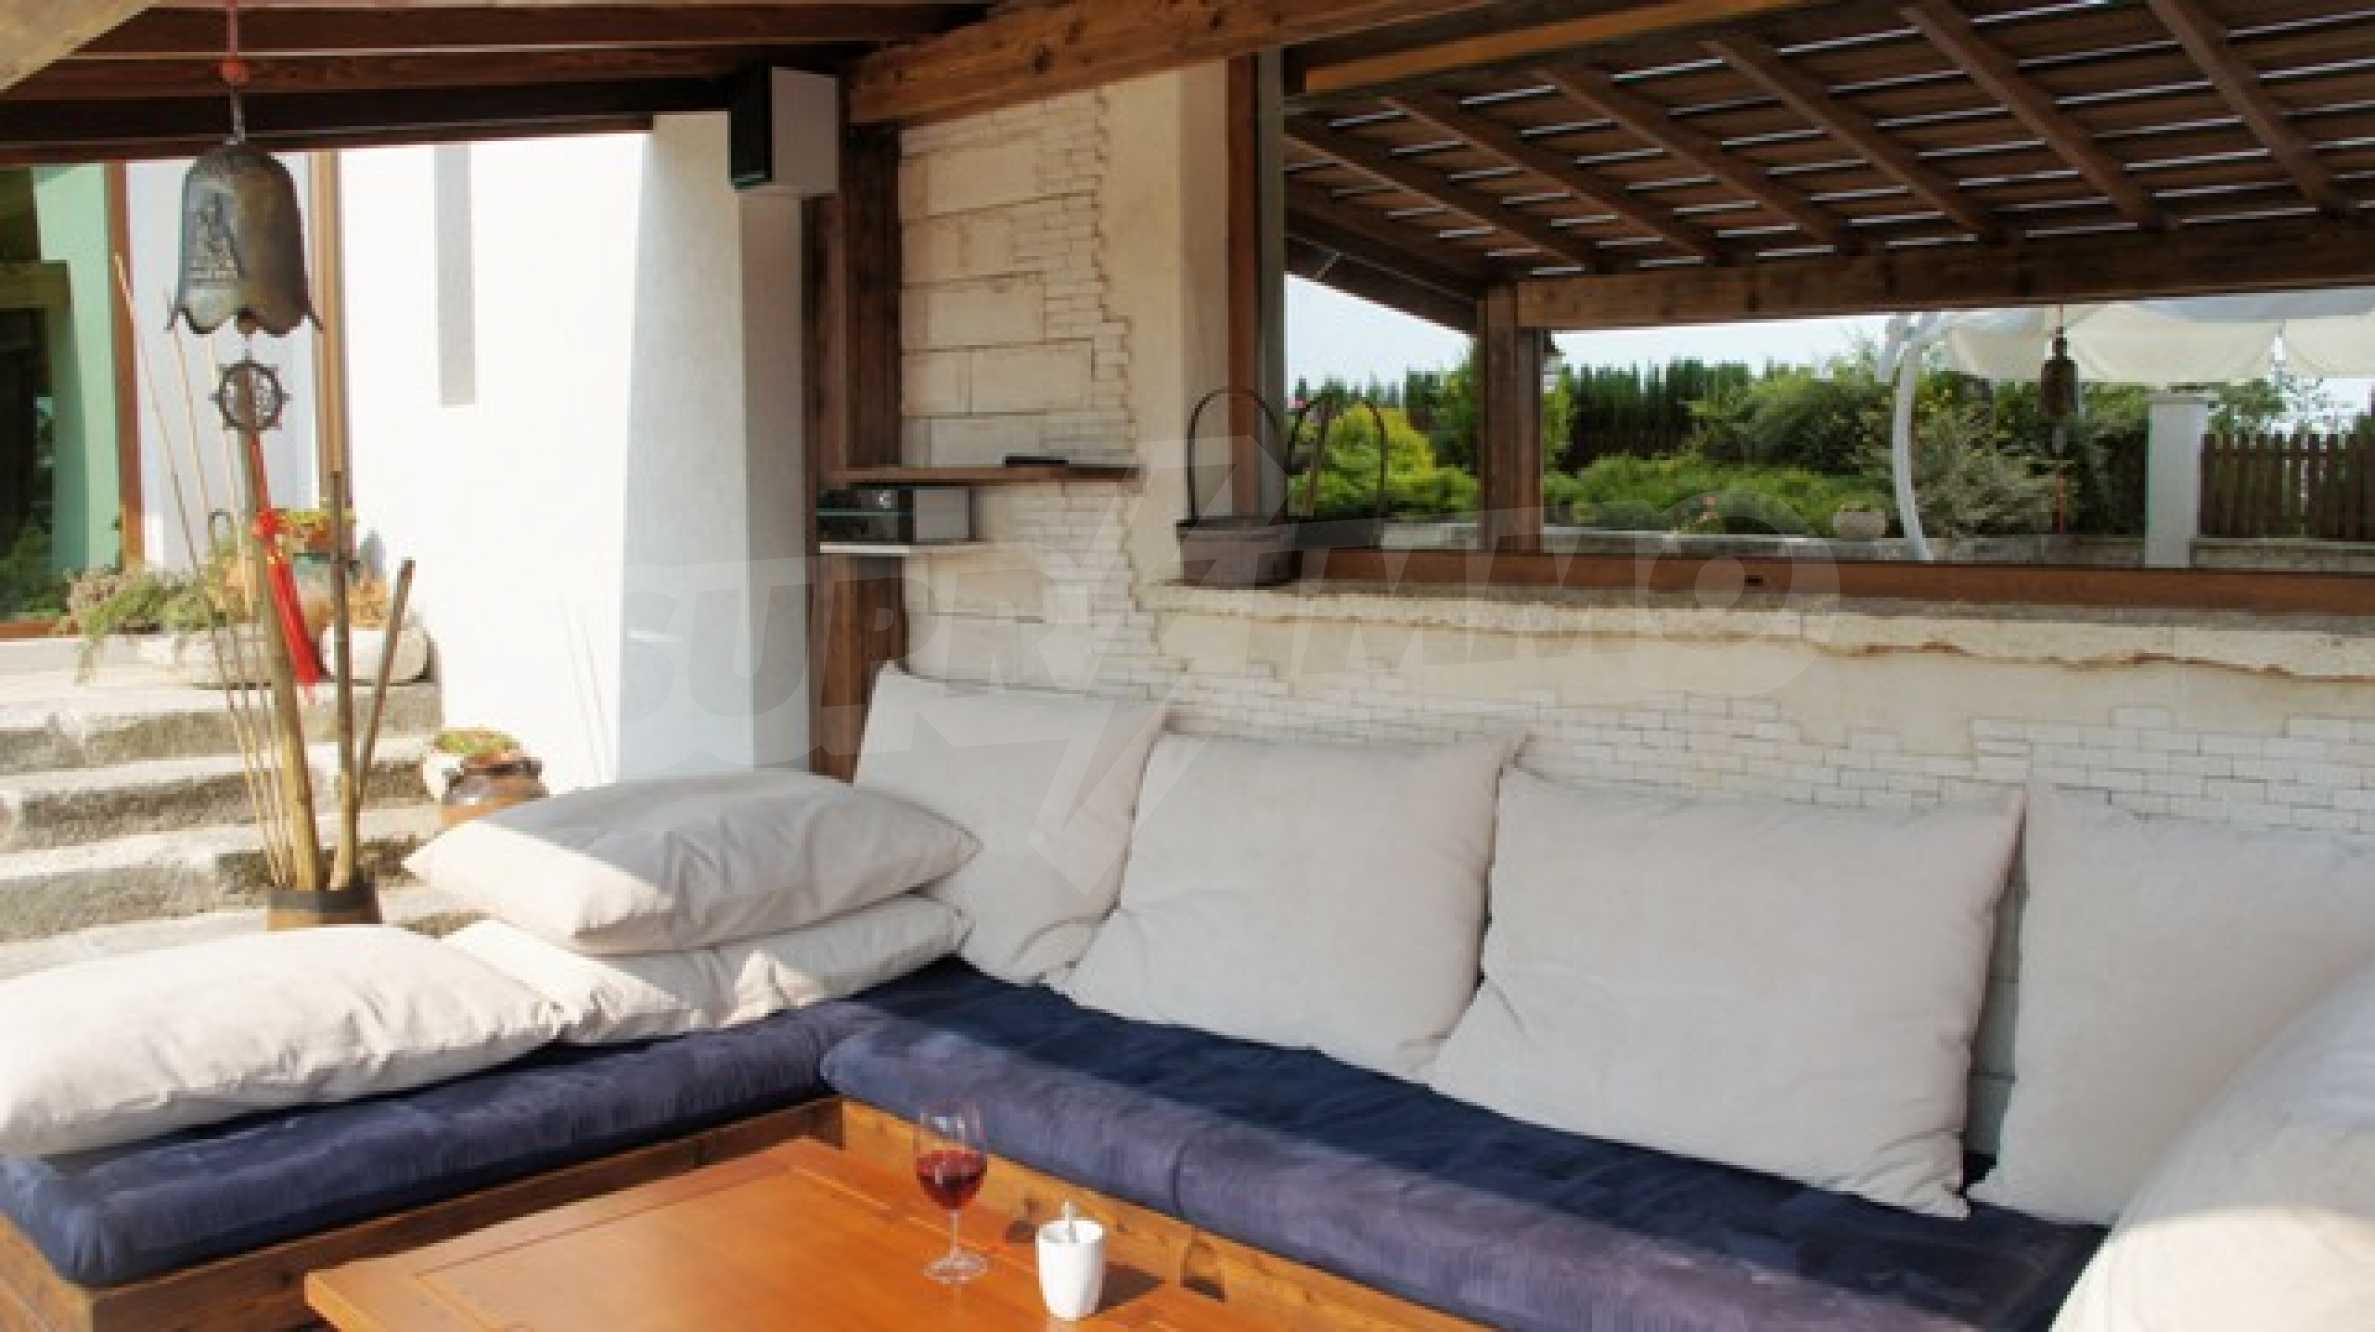 The Mediterranean style - a sense of luxury 24